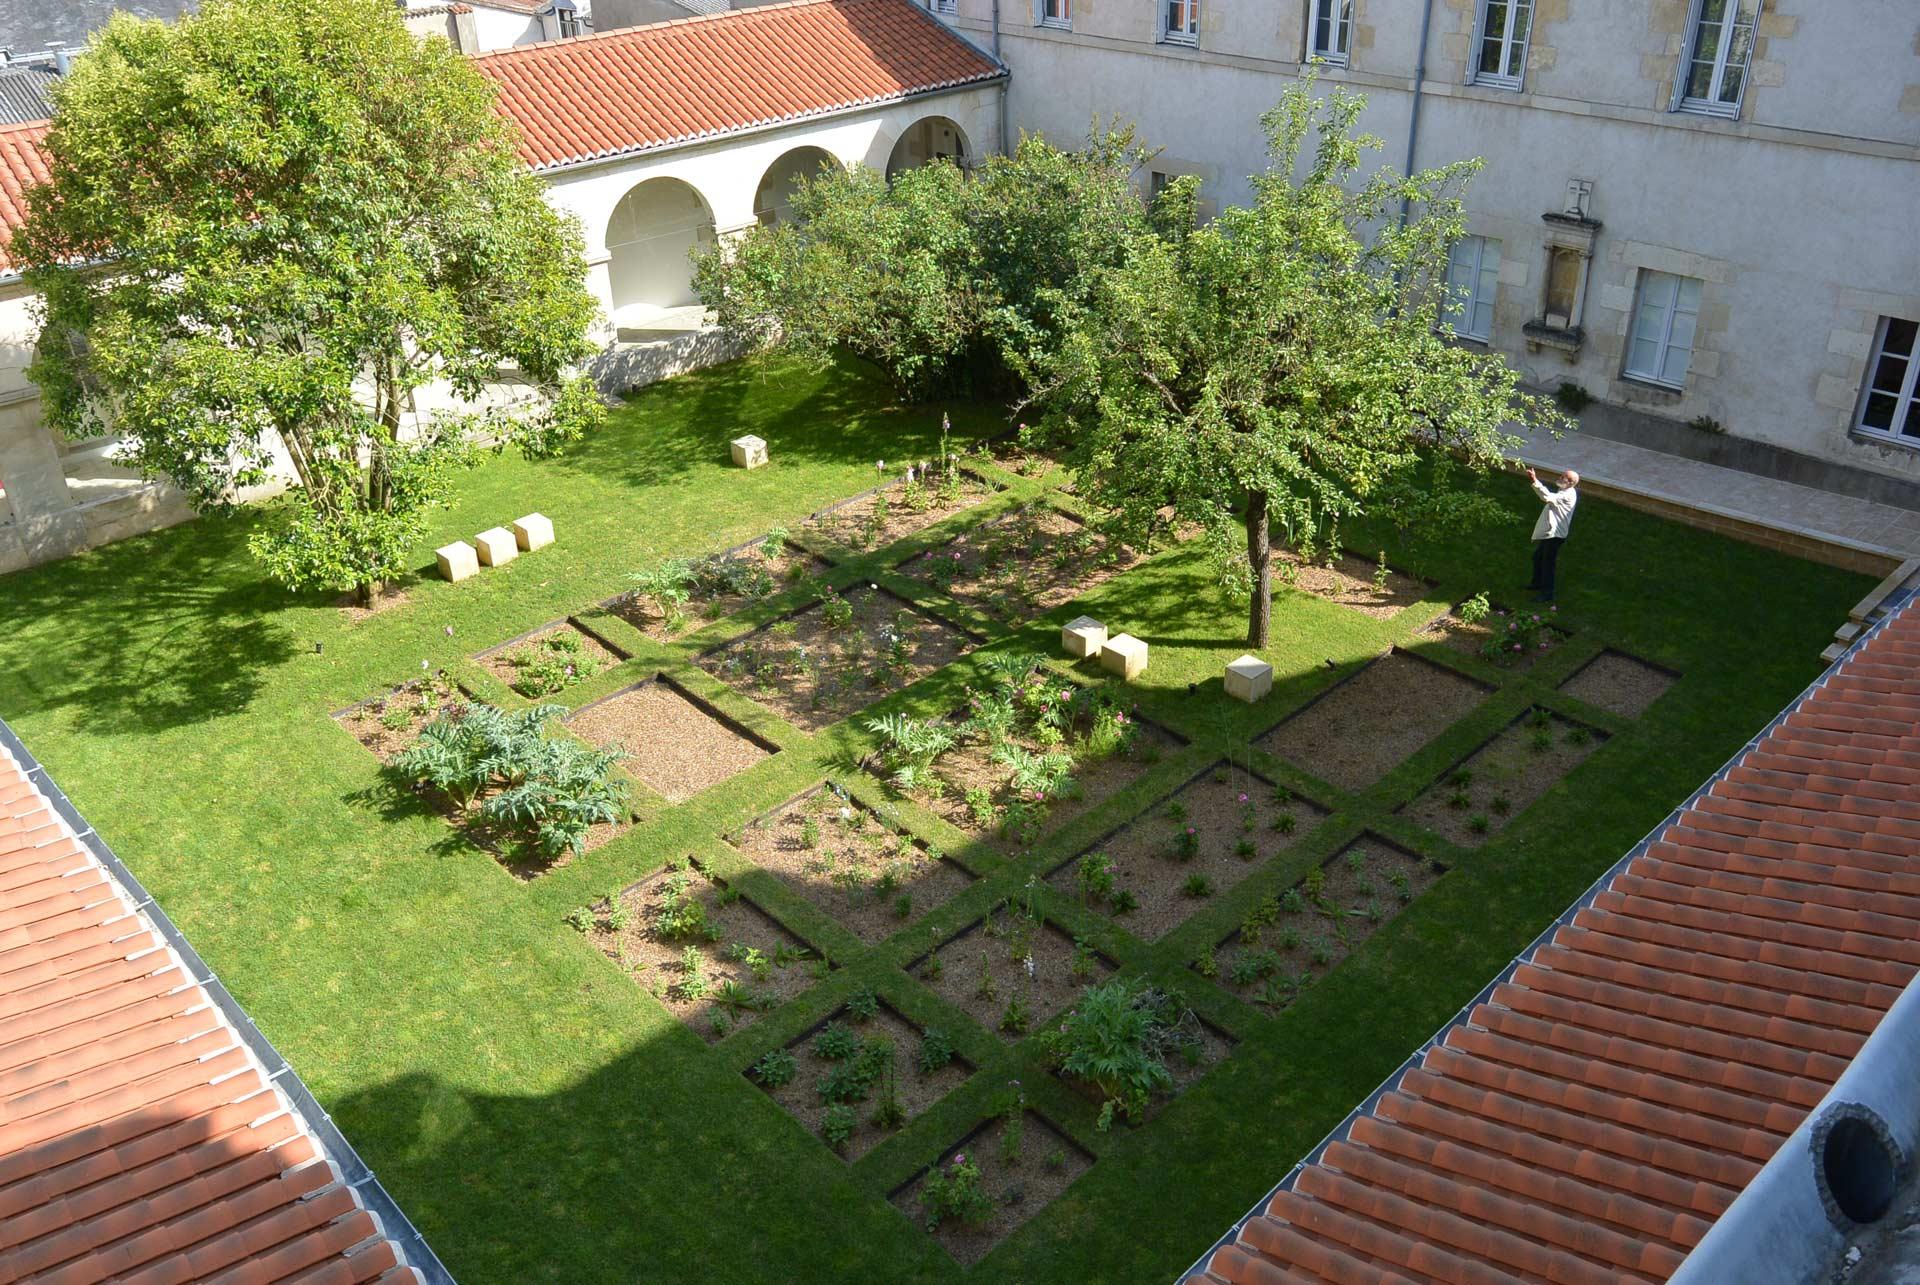 Le Jardin Clair Obscur by Wagon landscaping Landscape